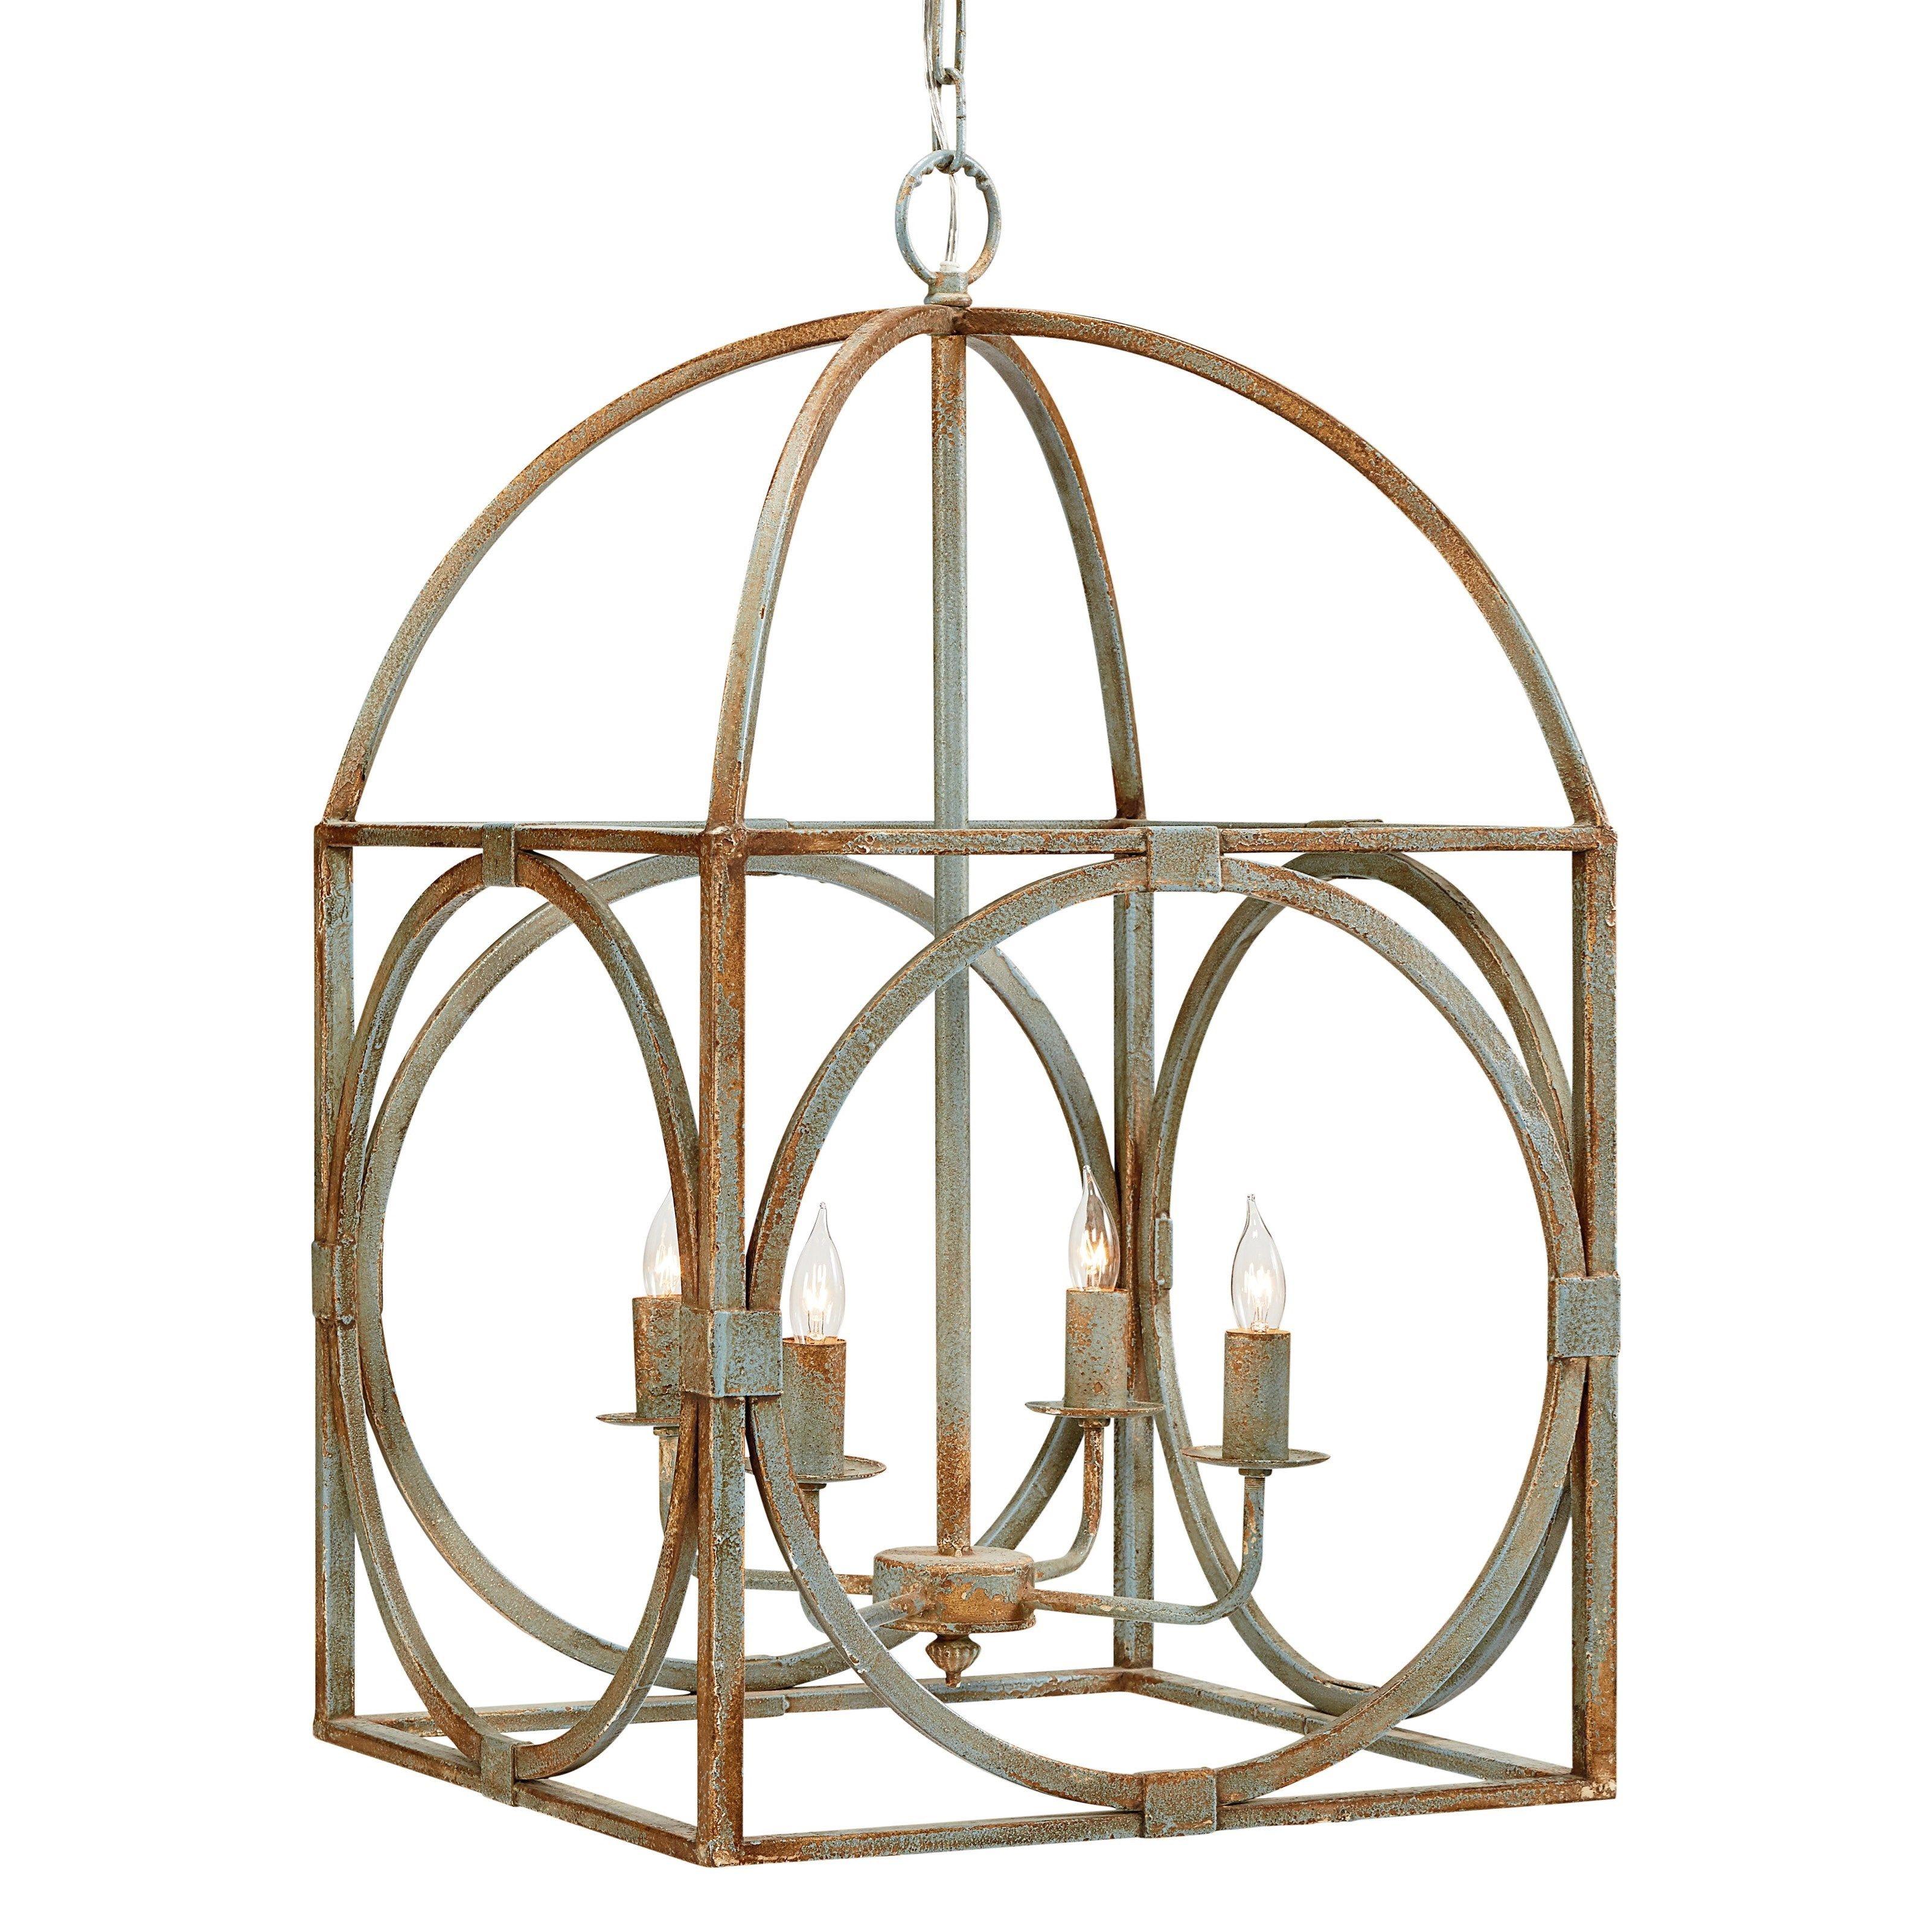 Rust Colored Metal Birdcage Chandelier NH DECOR